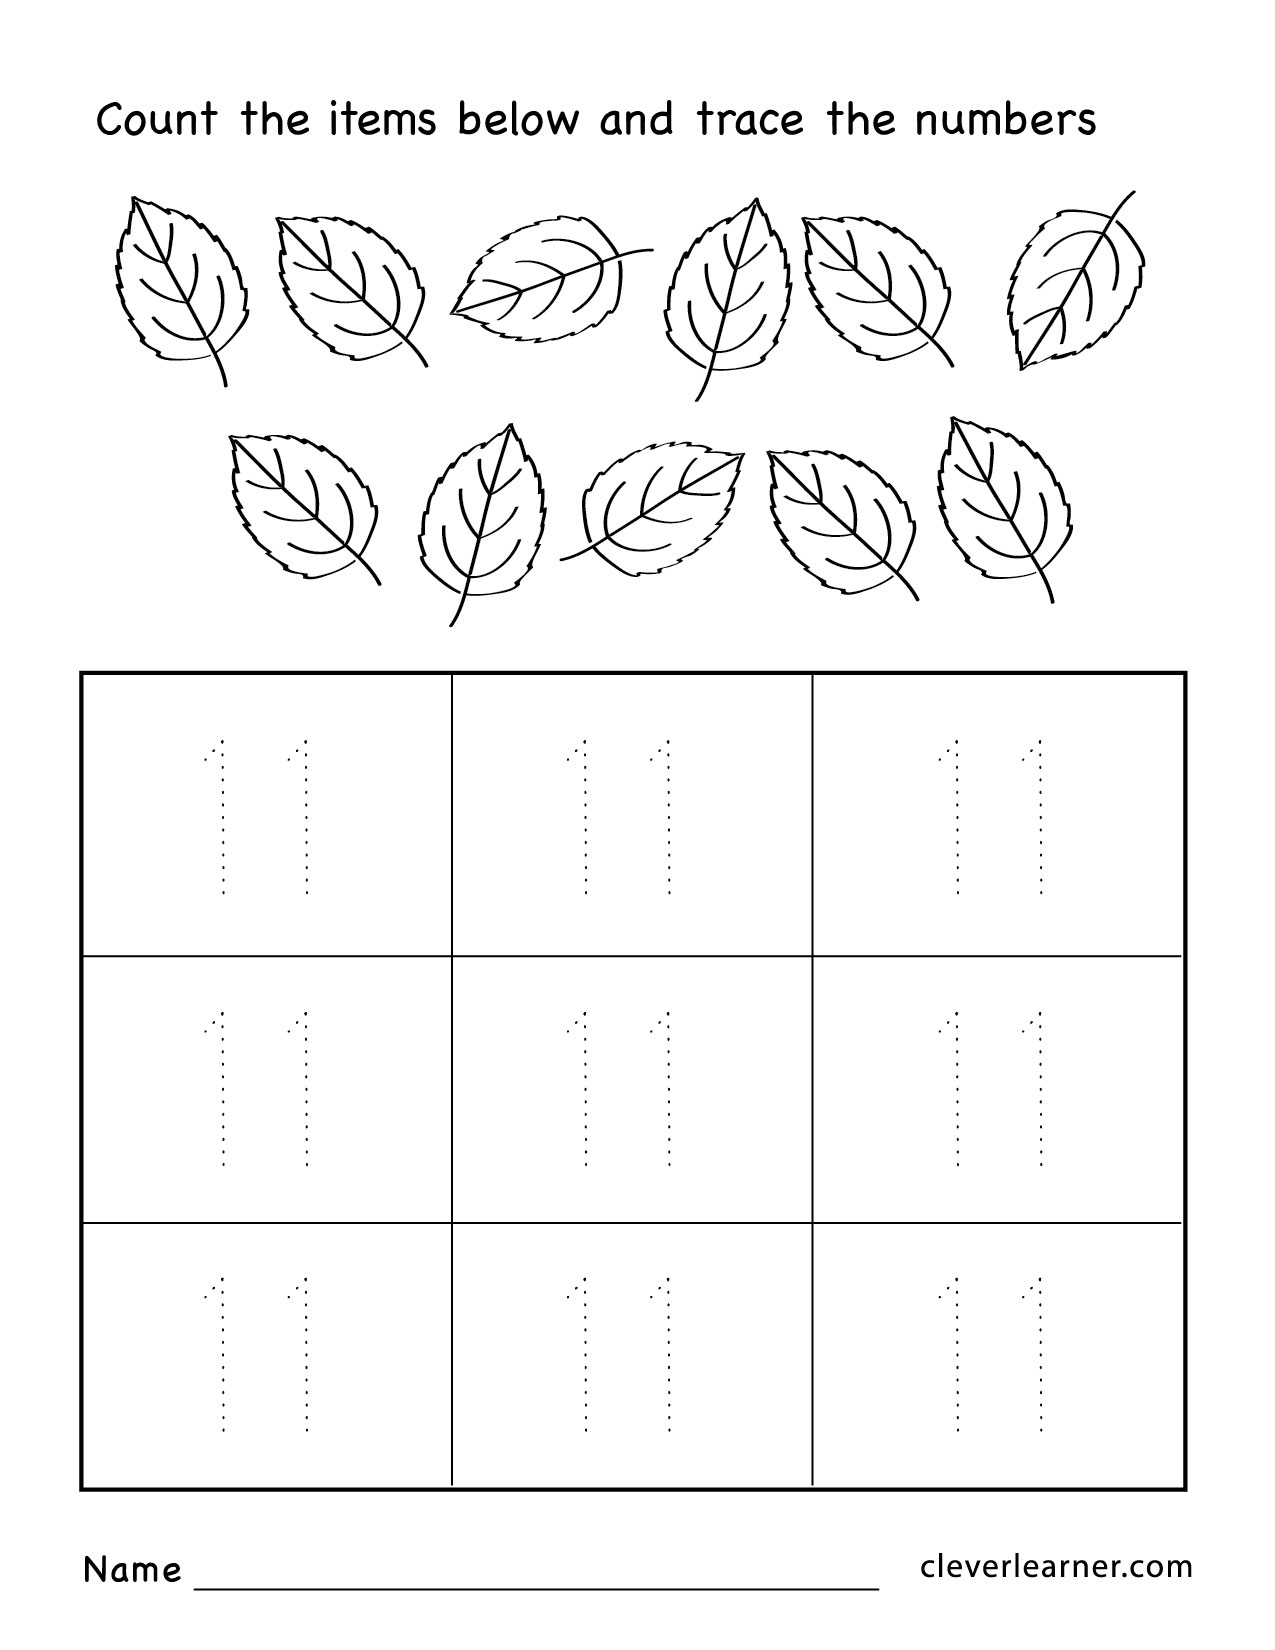 Number Tracing Worksheet 11 20